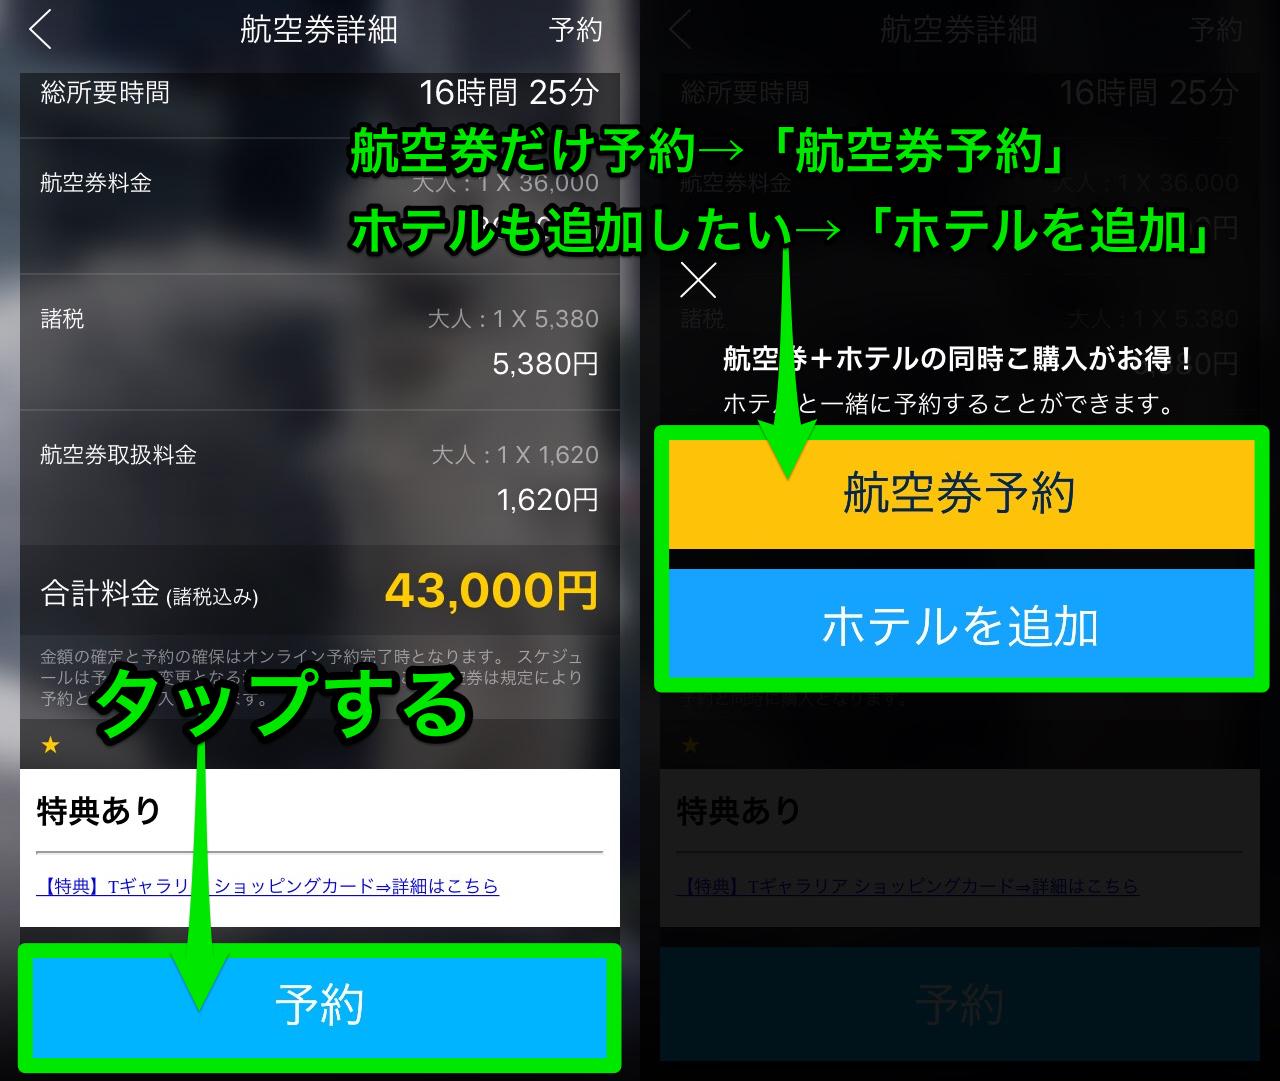 HISアプリ「航空券・ホテル」で航空券予約するかホテルを追加するか